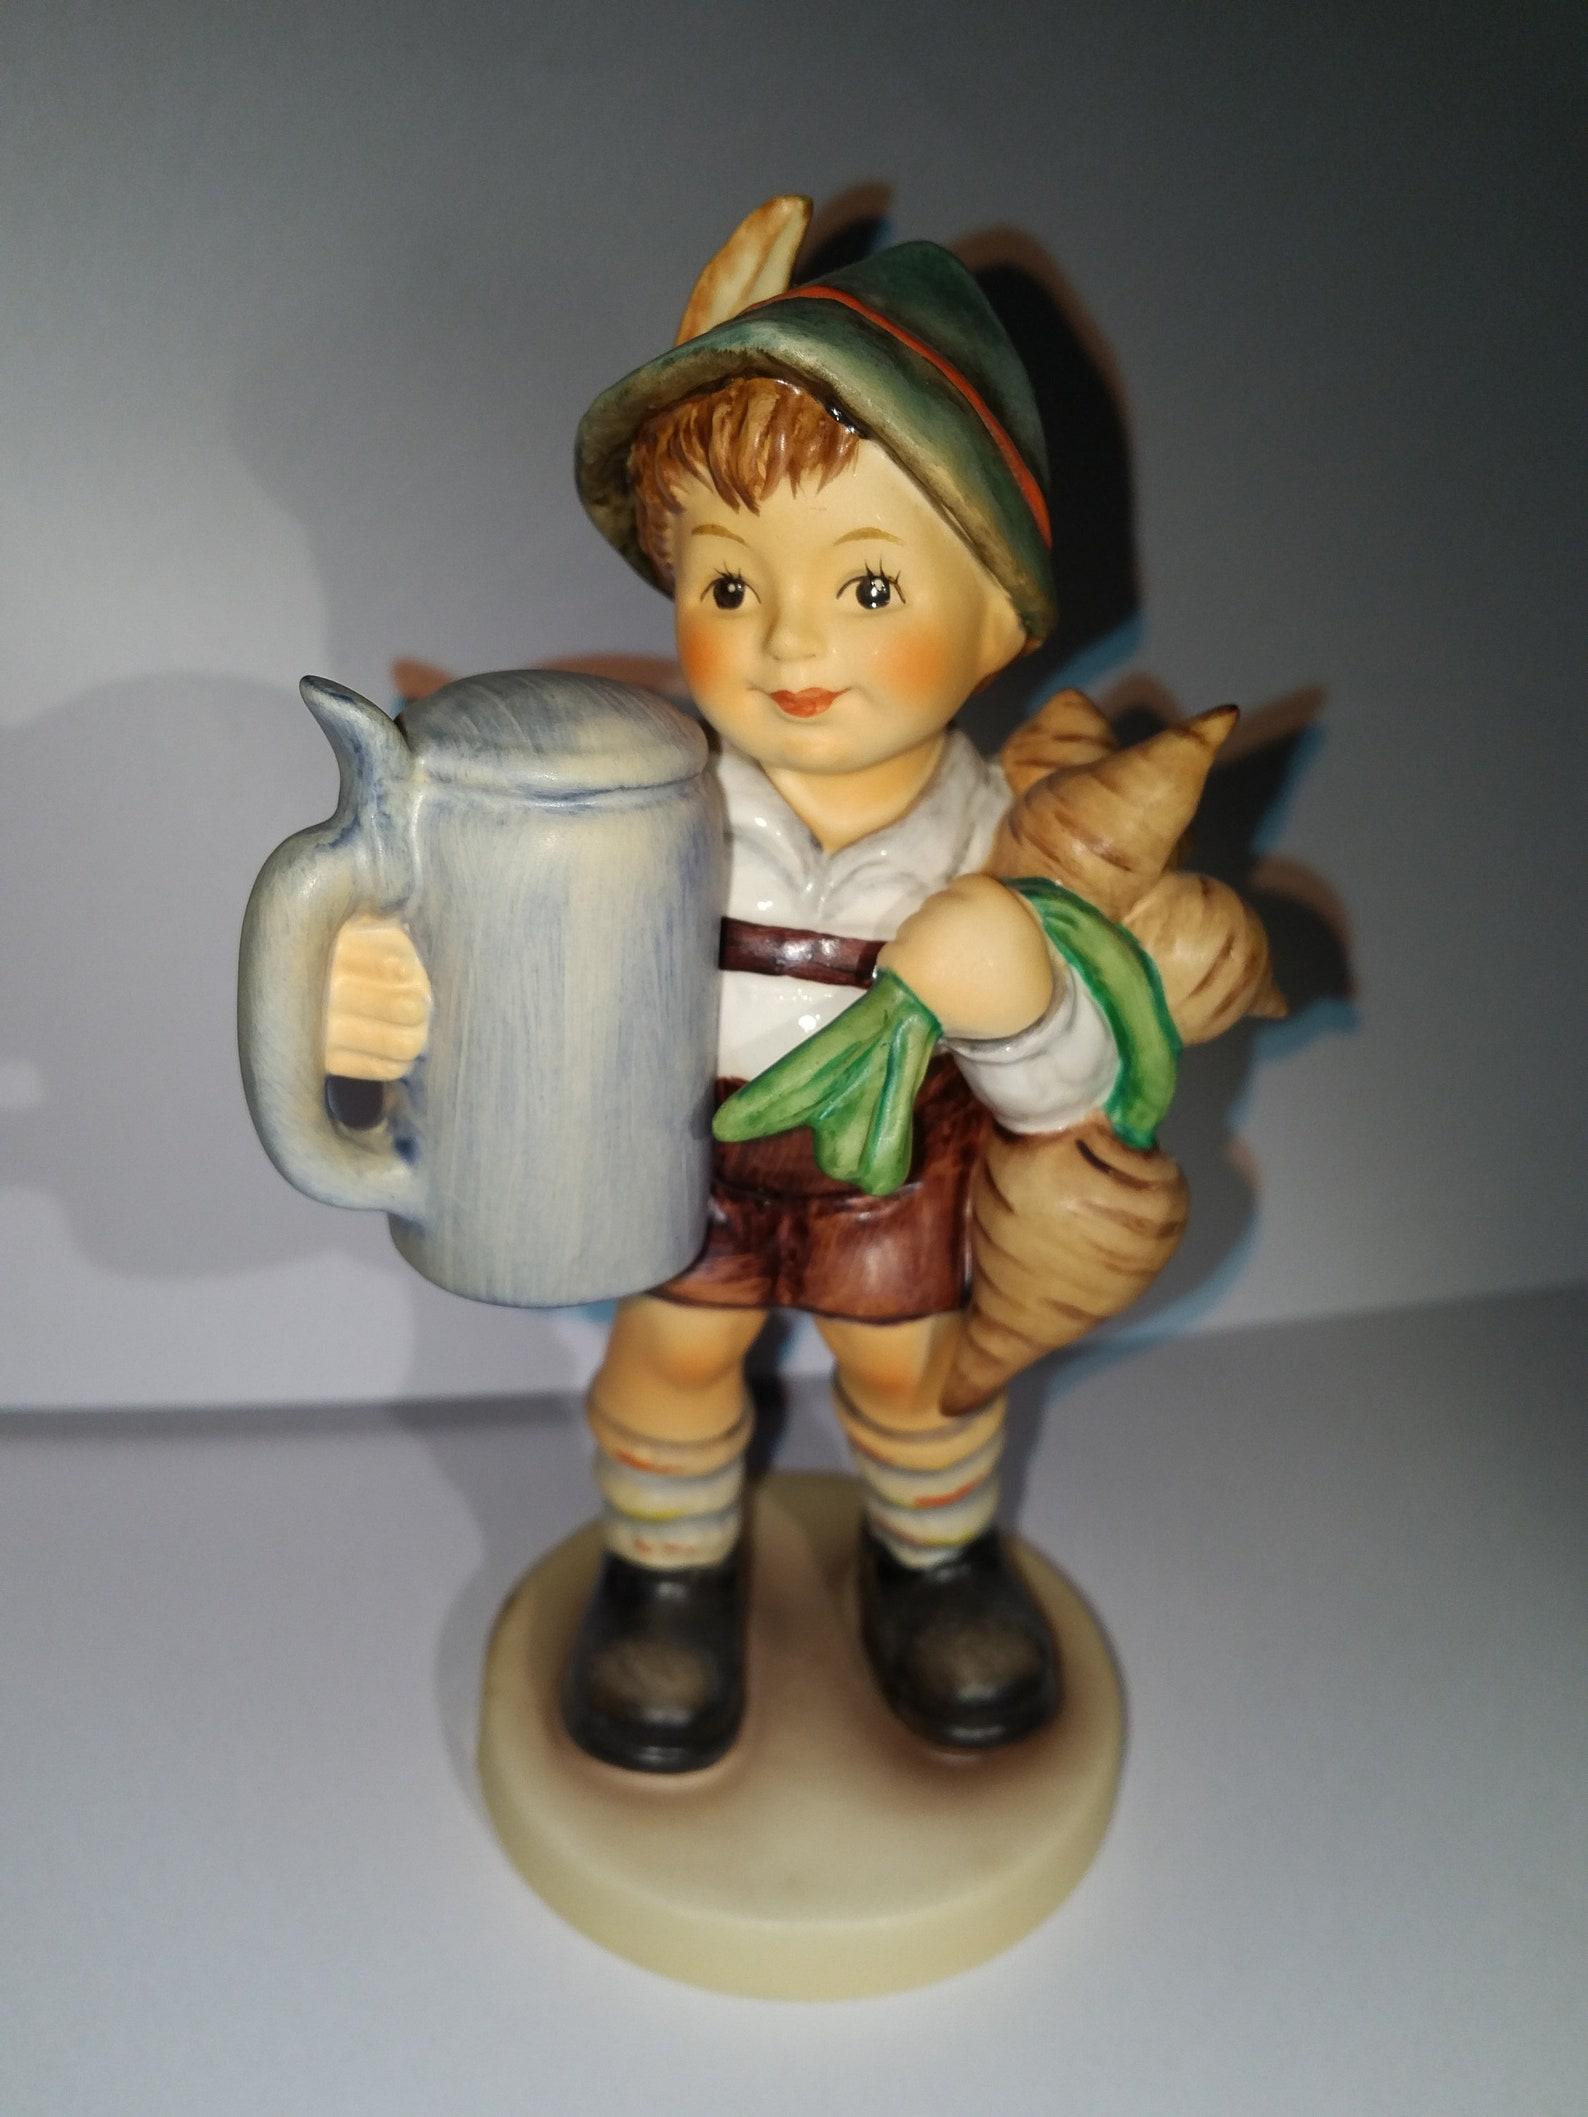 For Father - Goebel HUMMEL figurine